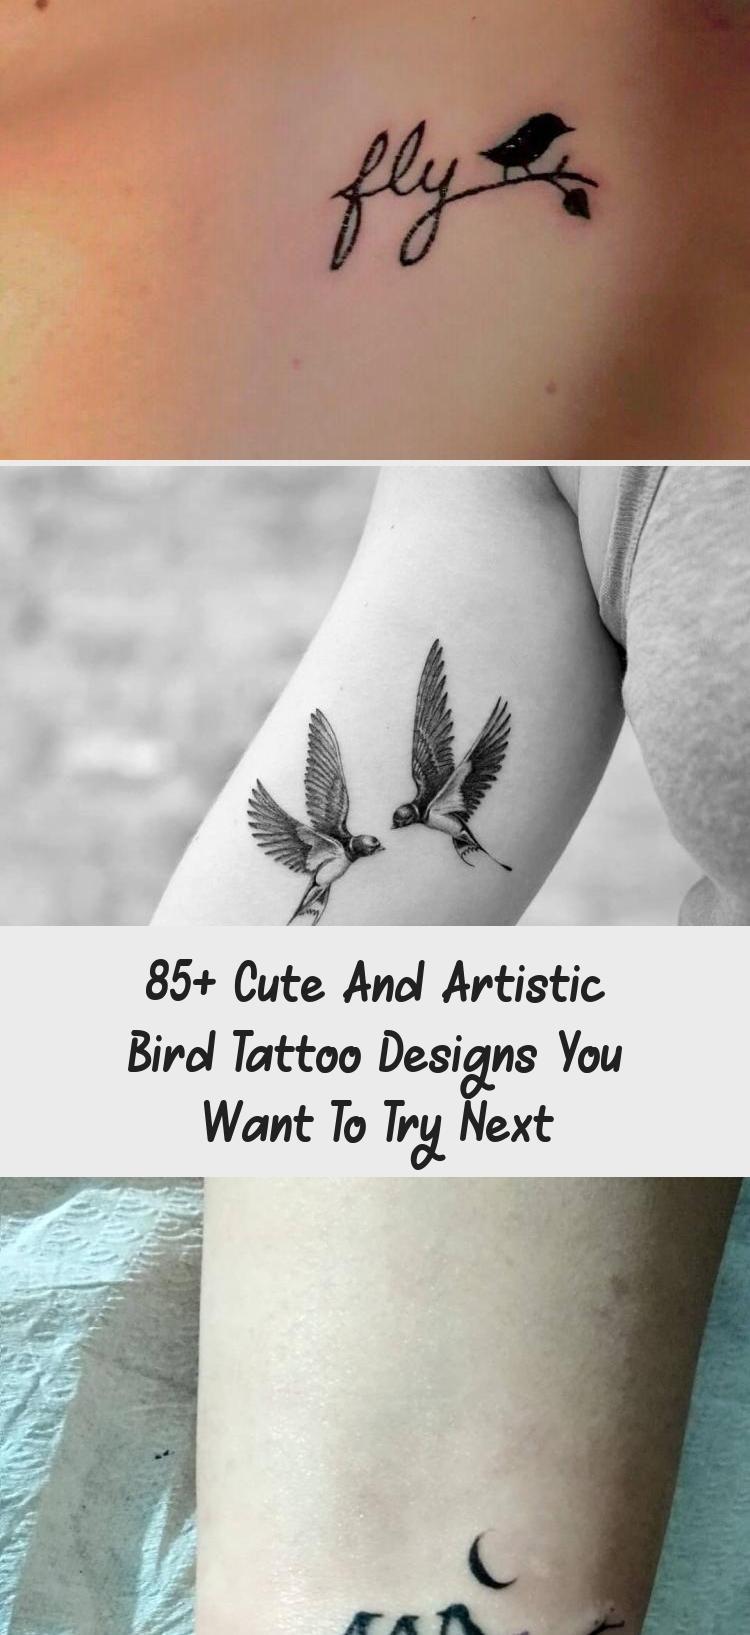 Evening Birds On A Branch Black Tattoo On Forearm Tattoos Tattooideas Birdtattoo Tattoodesign Blacktatto In 2020 Birds Tattoo Forearm Tattoo Girl Tattoo Designs